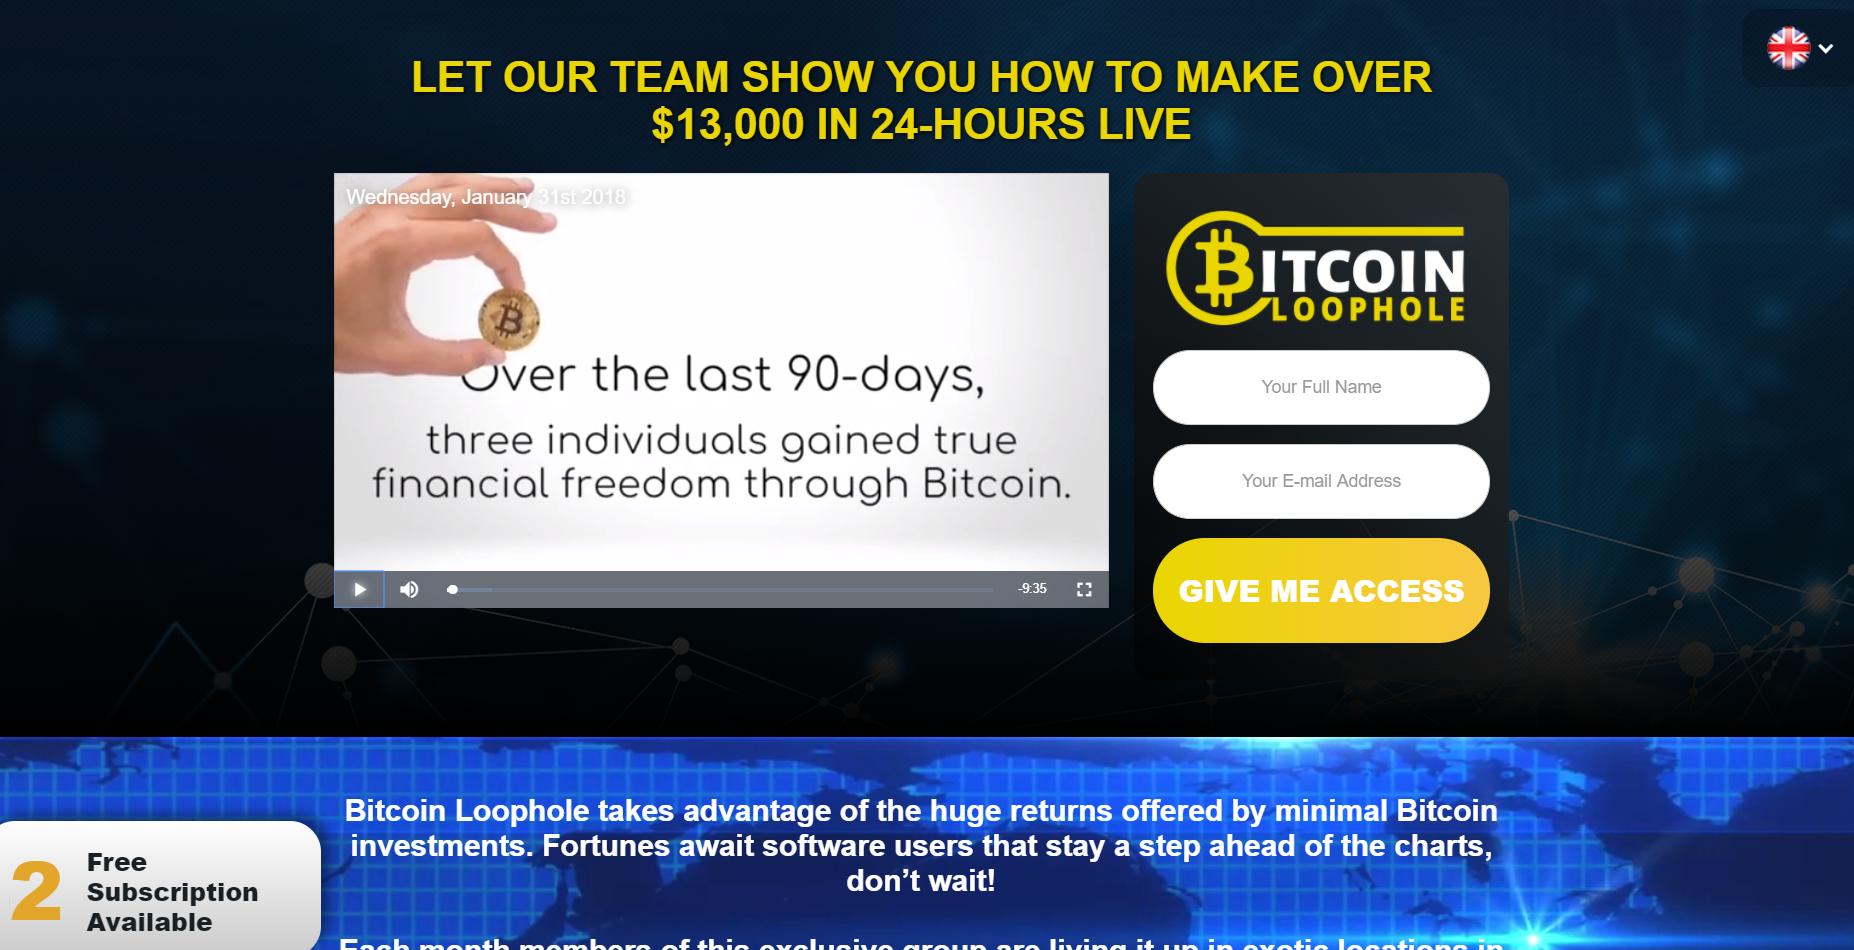 ads by Bitcoinloophole.co